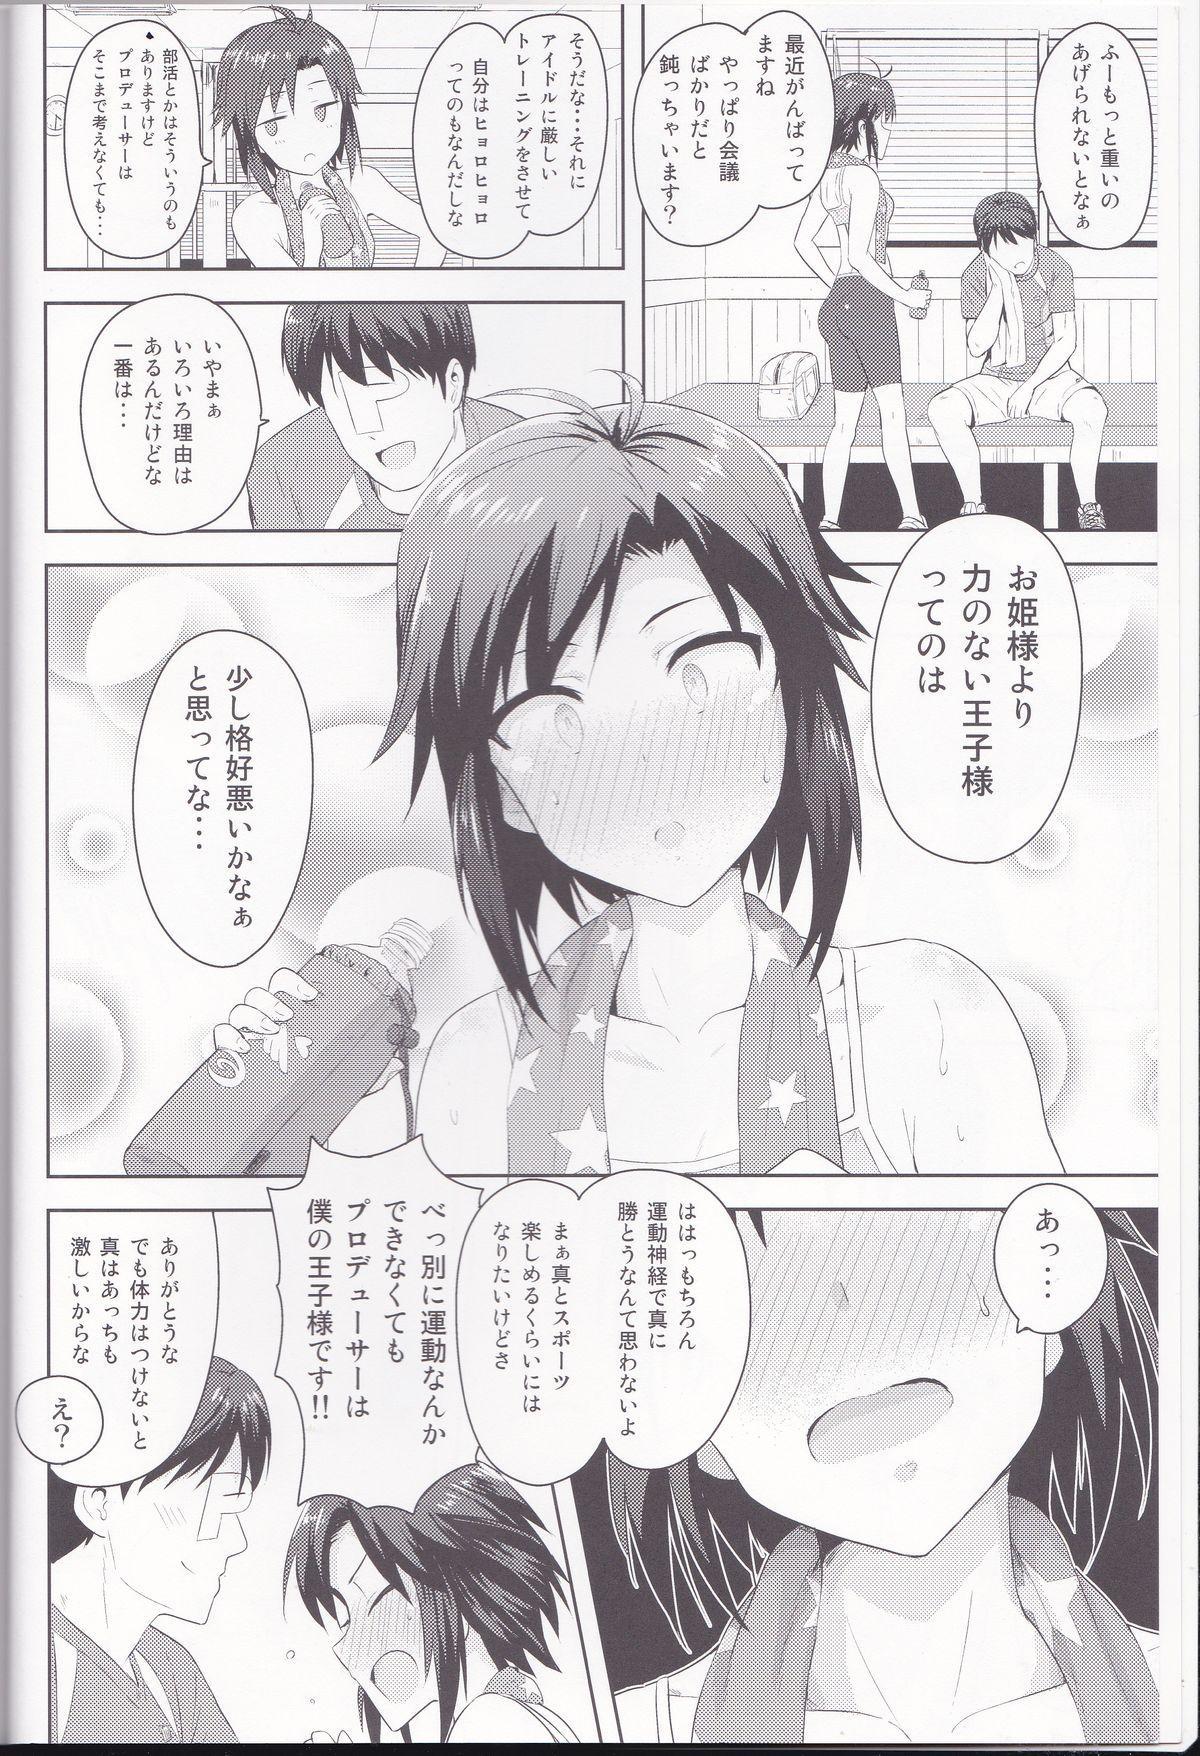 Makoto to Training! 2 2